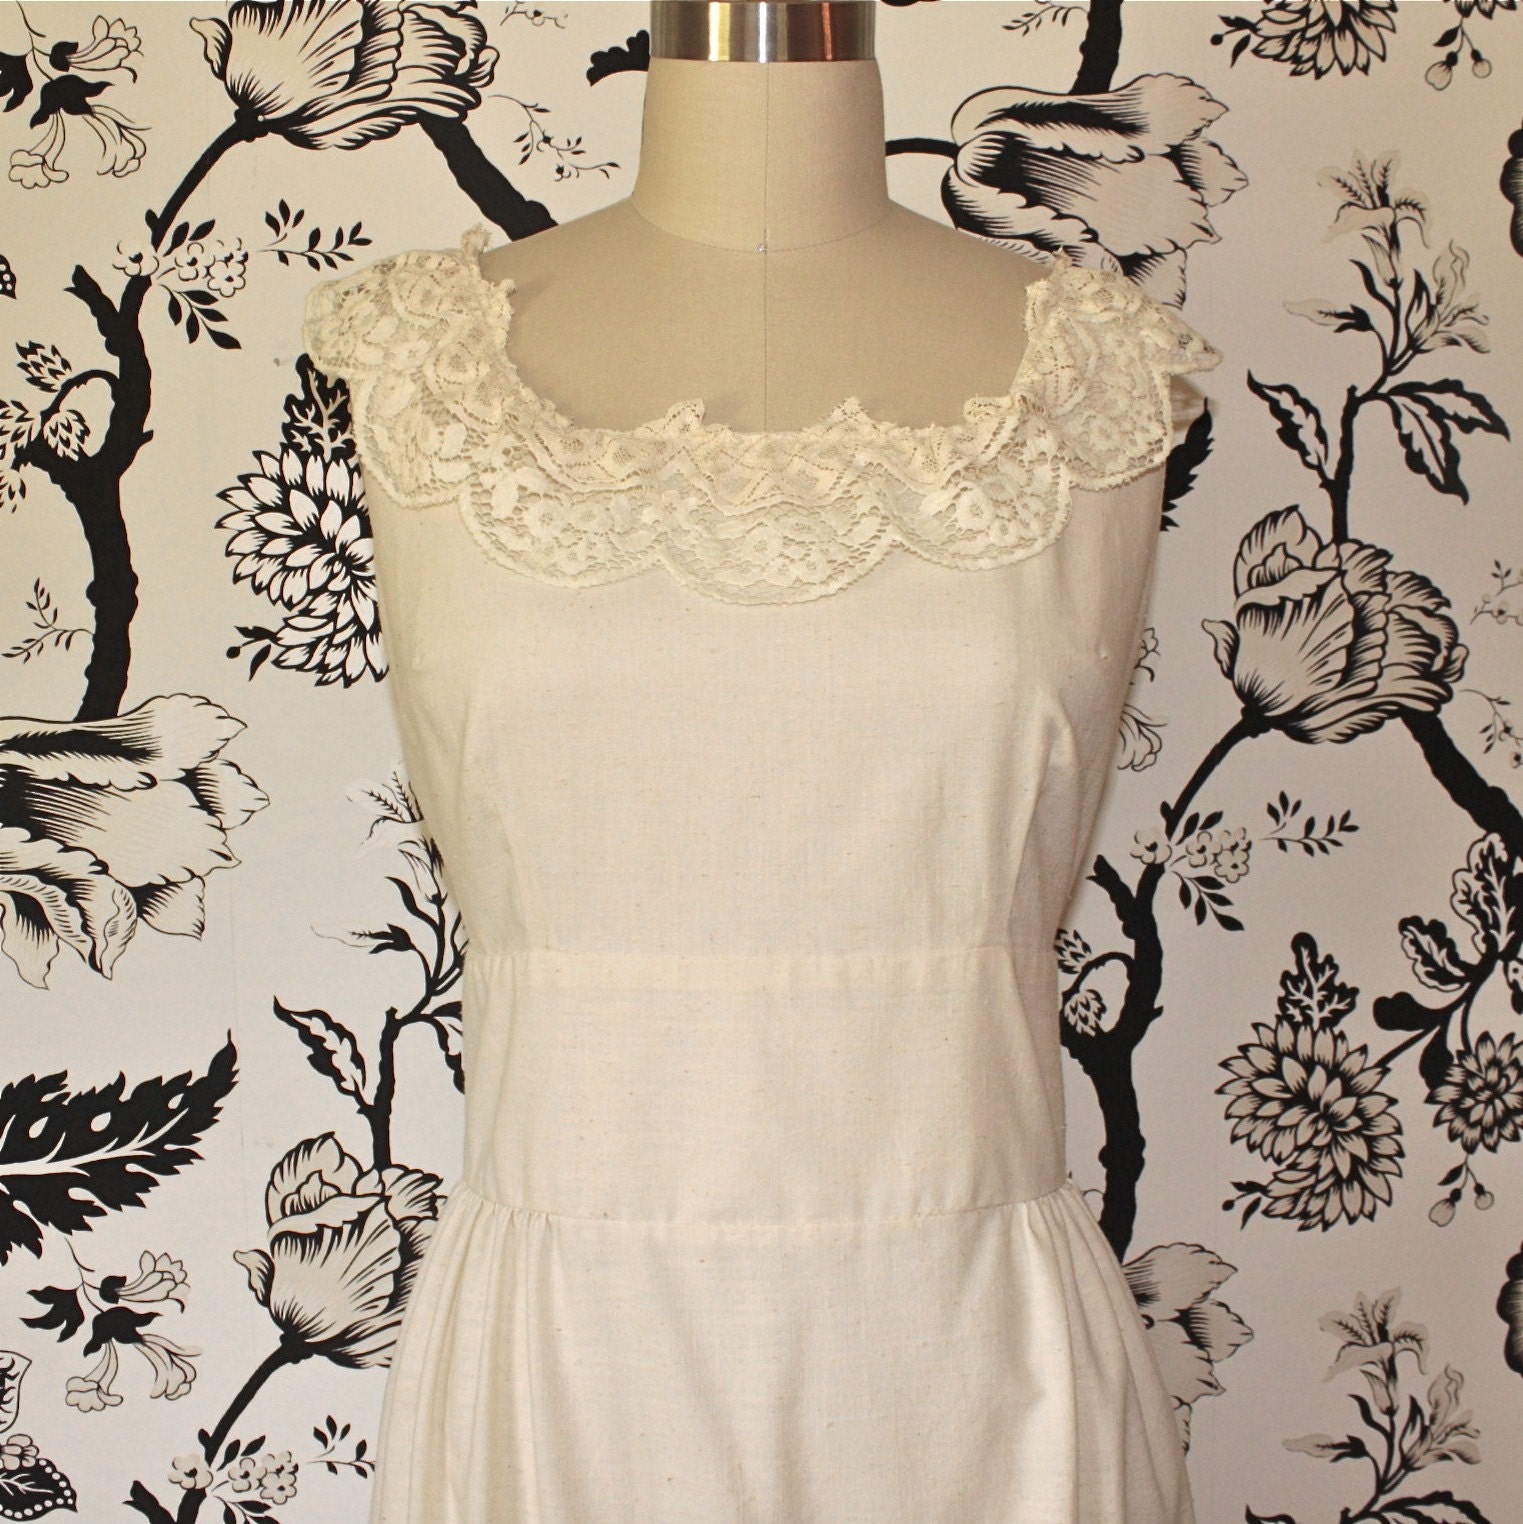 1970s vintage CREAM cotton BOHEMIAN wedding DRESS